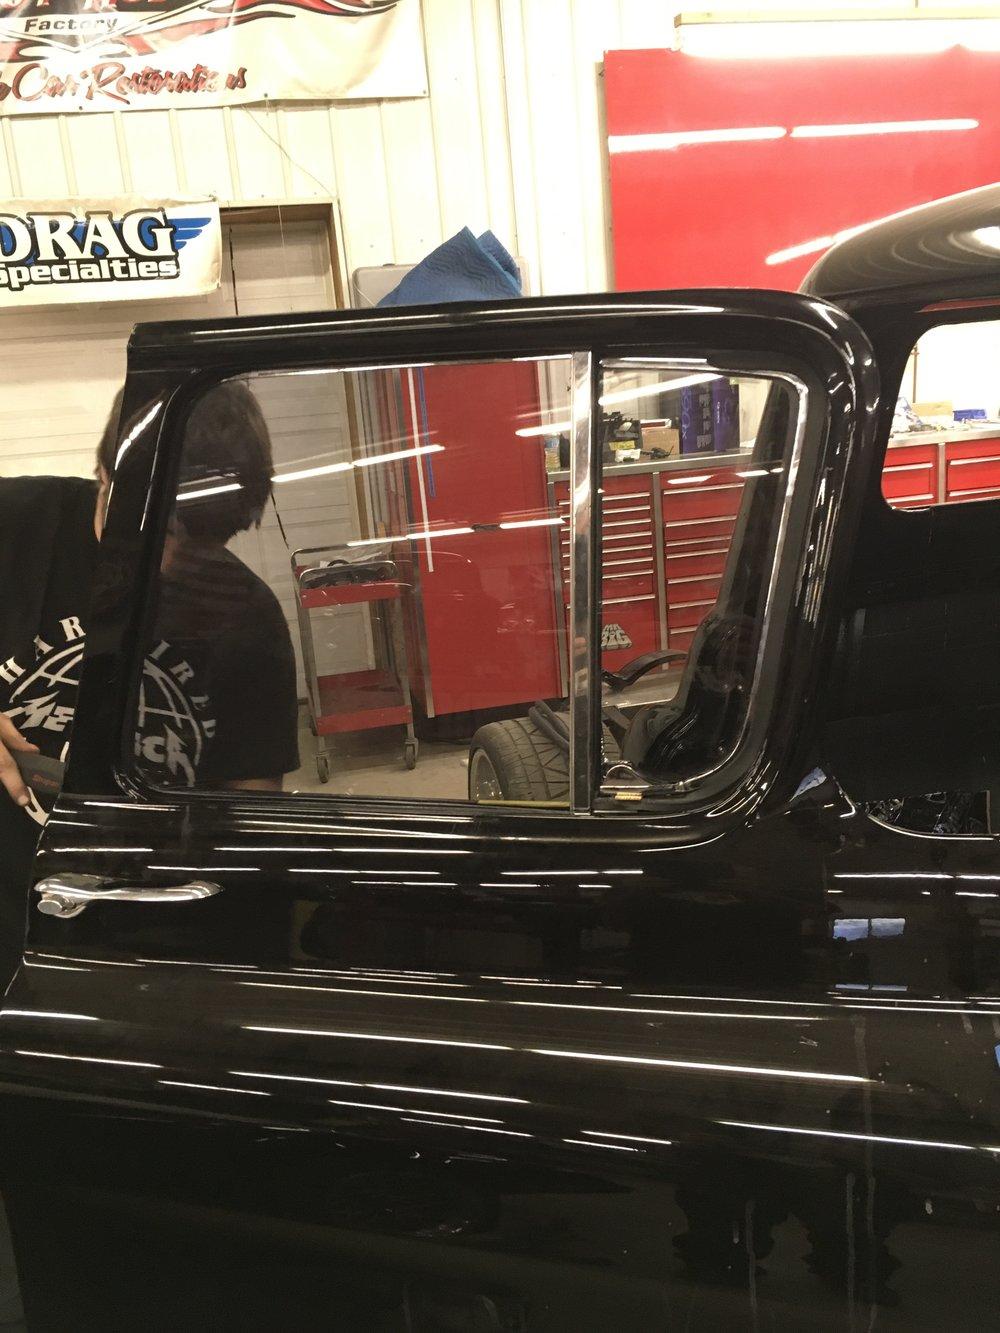 55-Chevy-minneapolis-minnesota-hot-rod-restoration-86.jpg